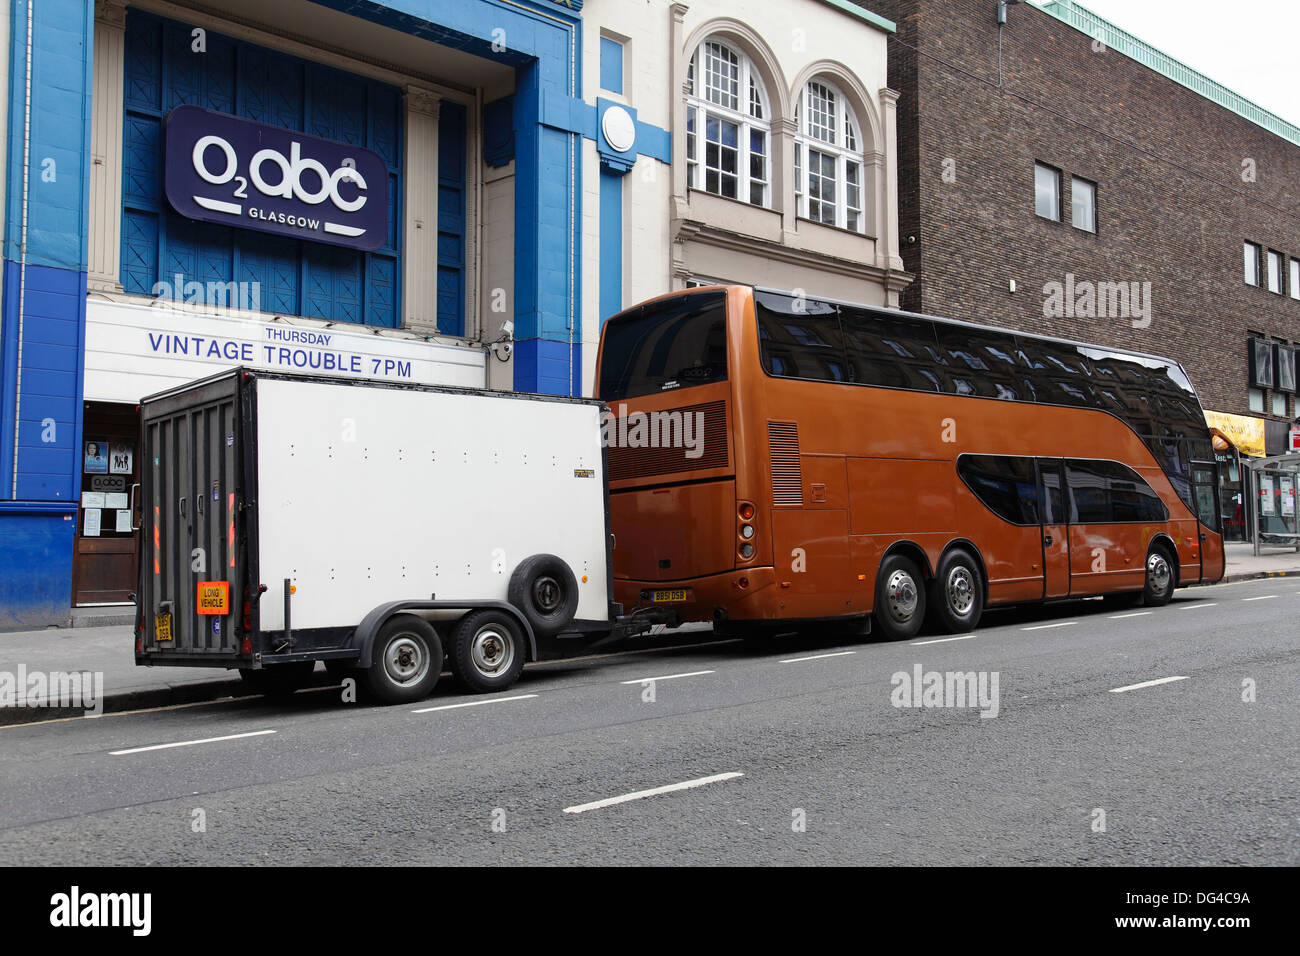 Tour bus outside the O2 abc where Blues Band Vintage Trouble performed, Sauchiehall Street, Glasgow city centre, Scotland, UK - Stock Image